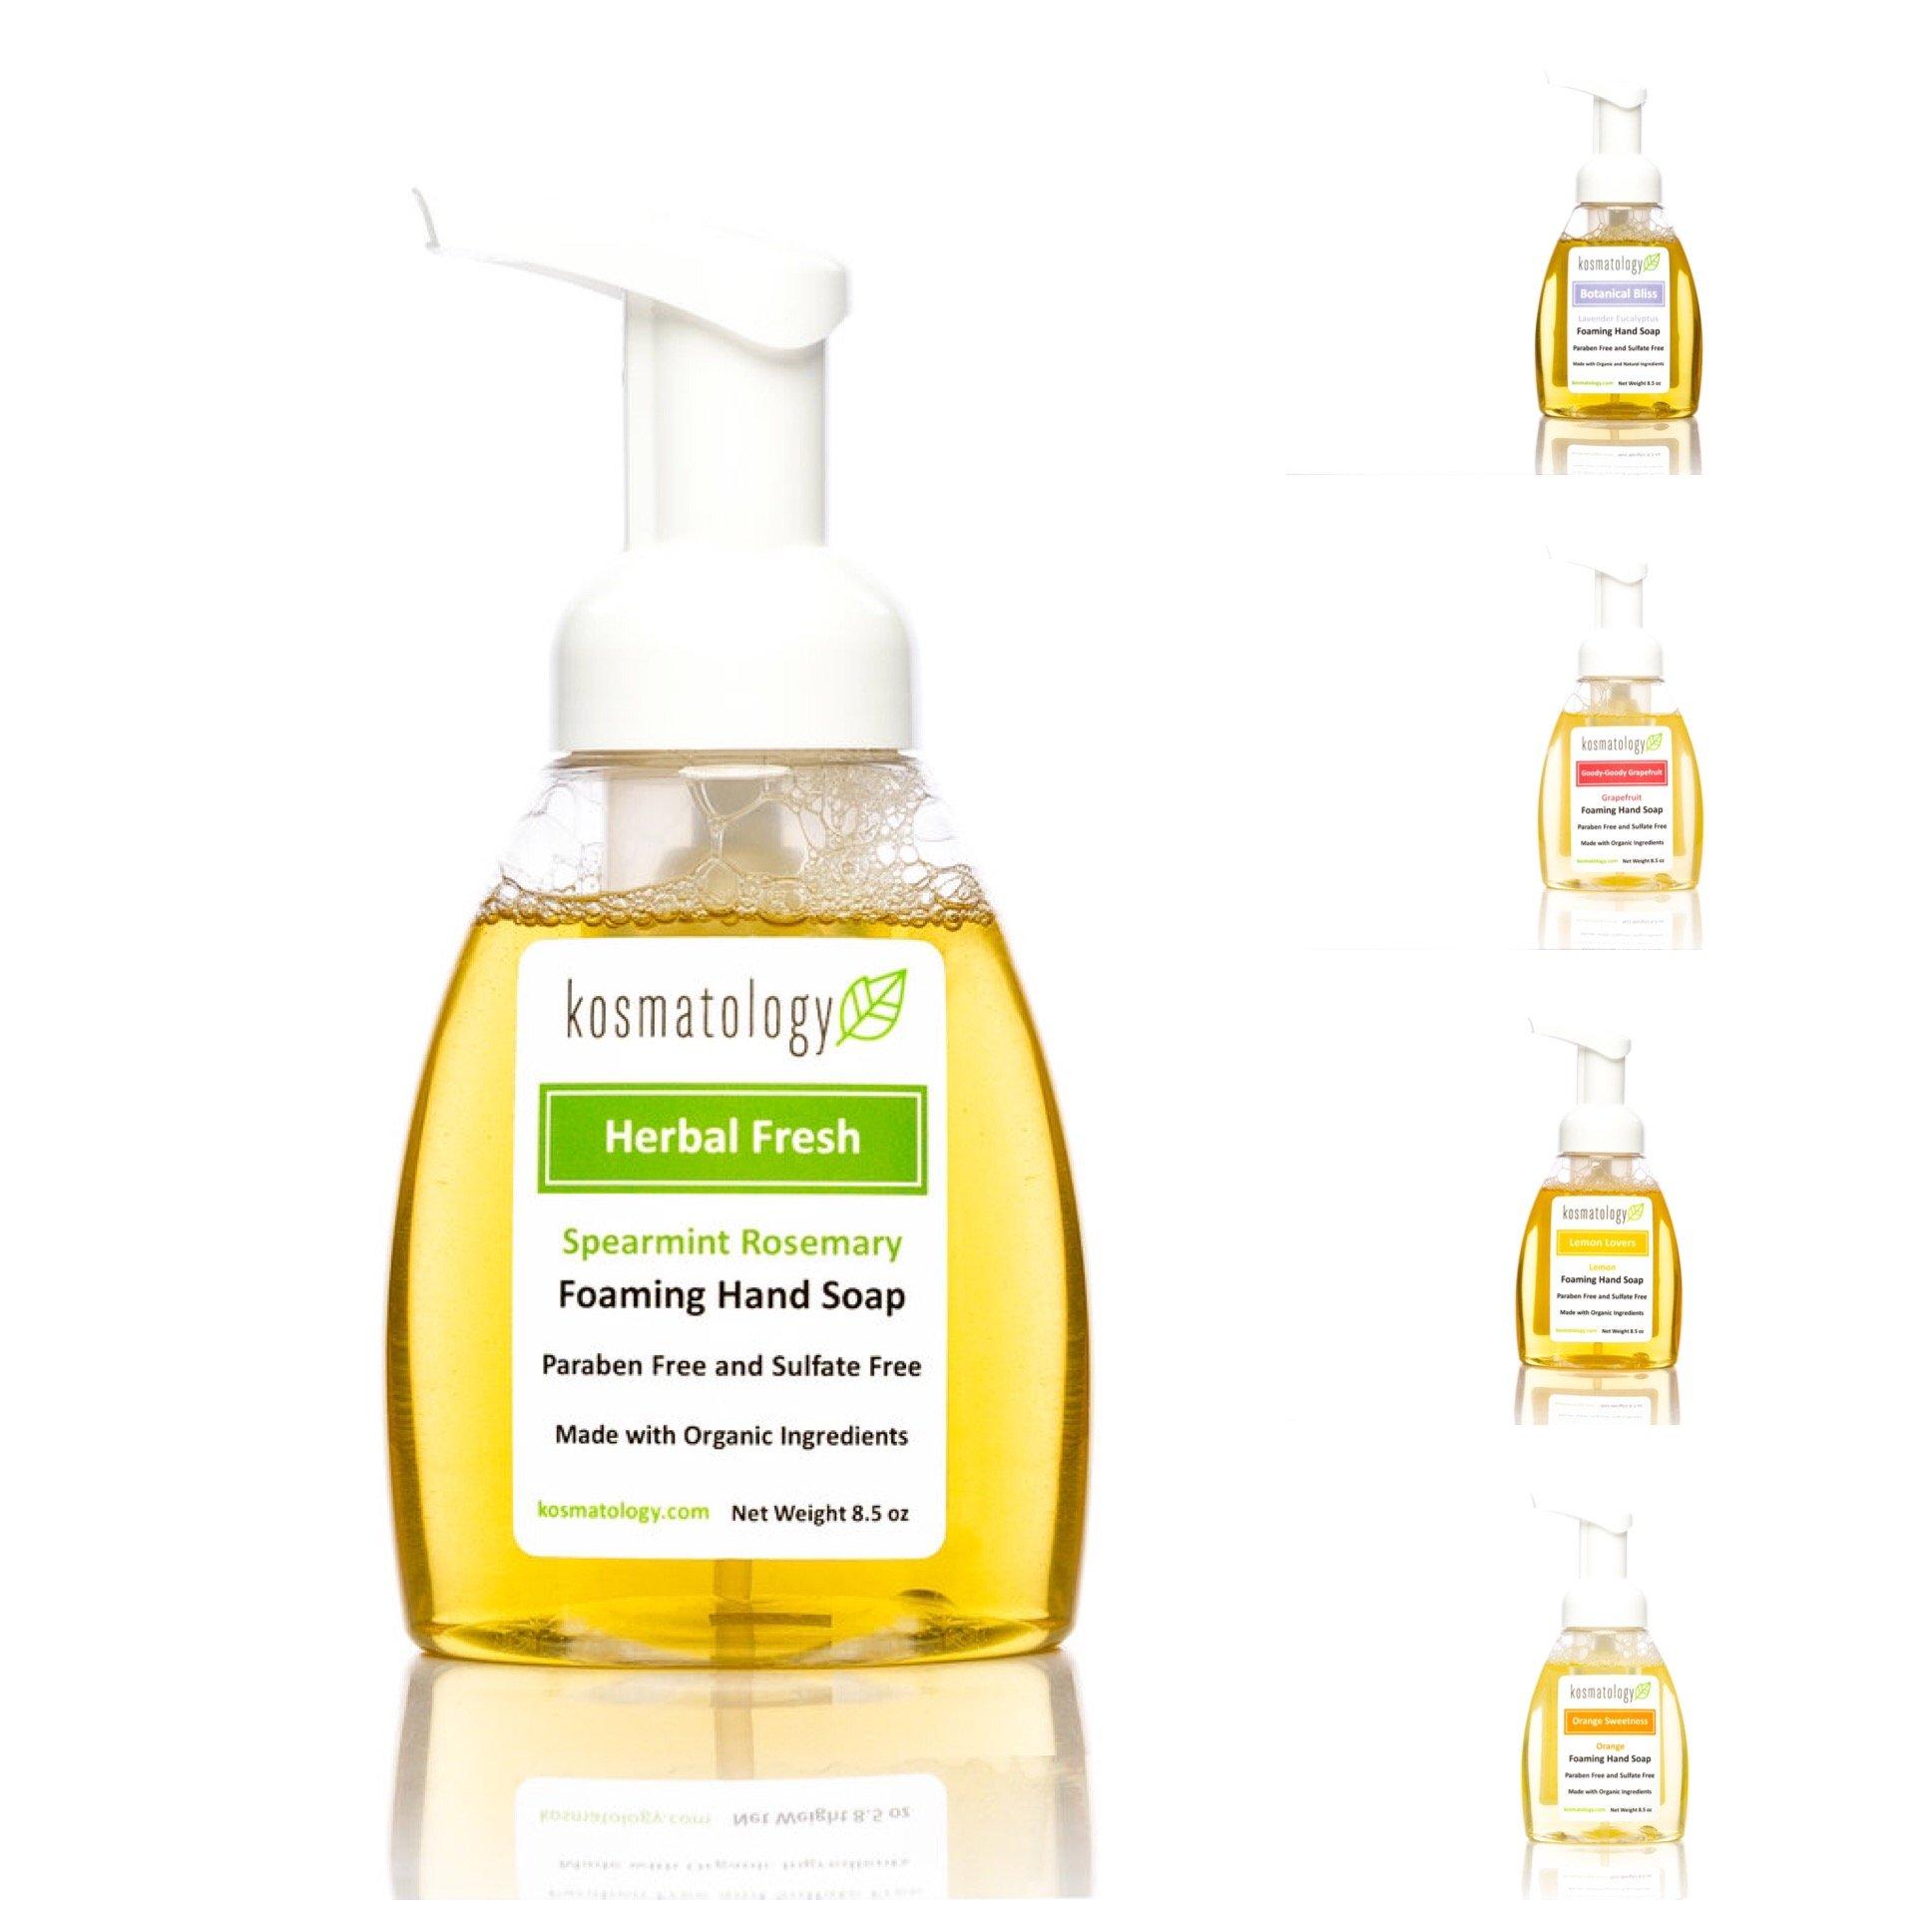 Foaming Face Wash Lemongrass - 6 fl. oz. by Kosmatology (PACK OF 6) Darphin - Dark Circles Relief & De-Puffing Eye Serum -15ml/0.5oz